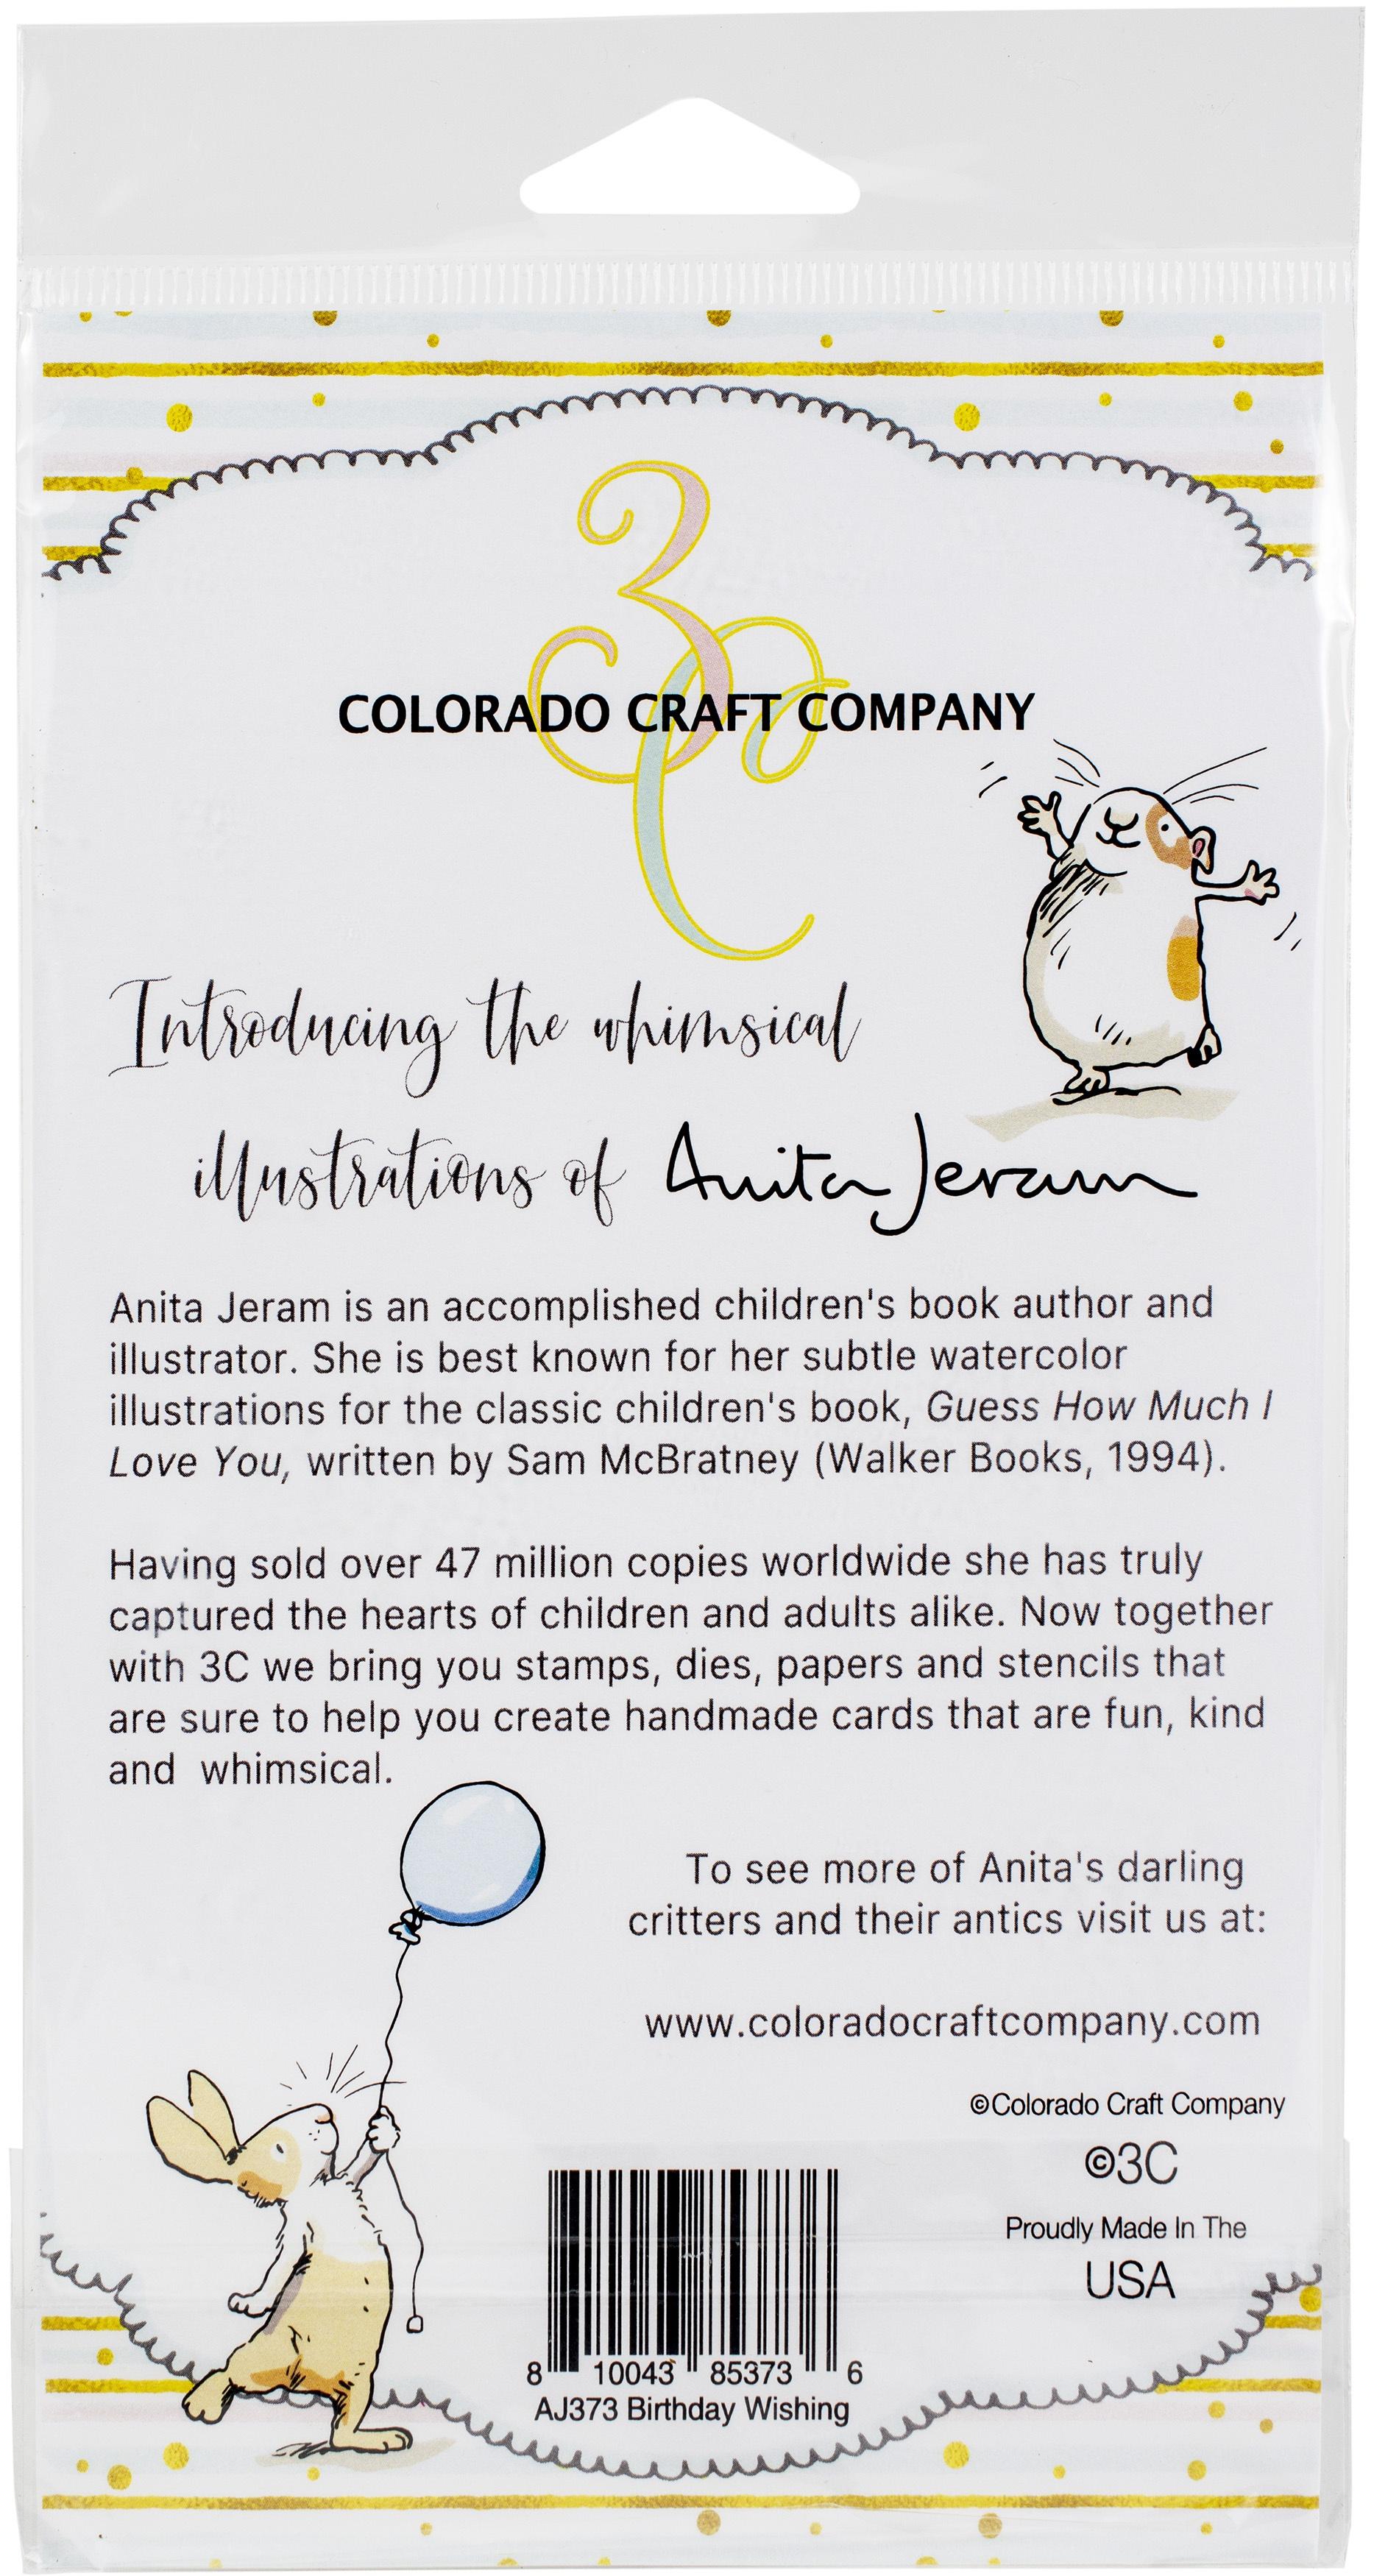 Colorado Craft Company Clear Stamps 4X6-Birthday Wishing-By Anita Jeram